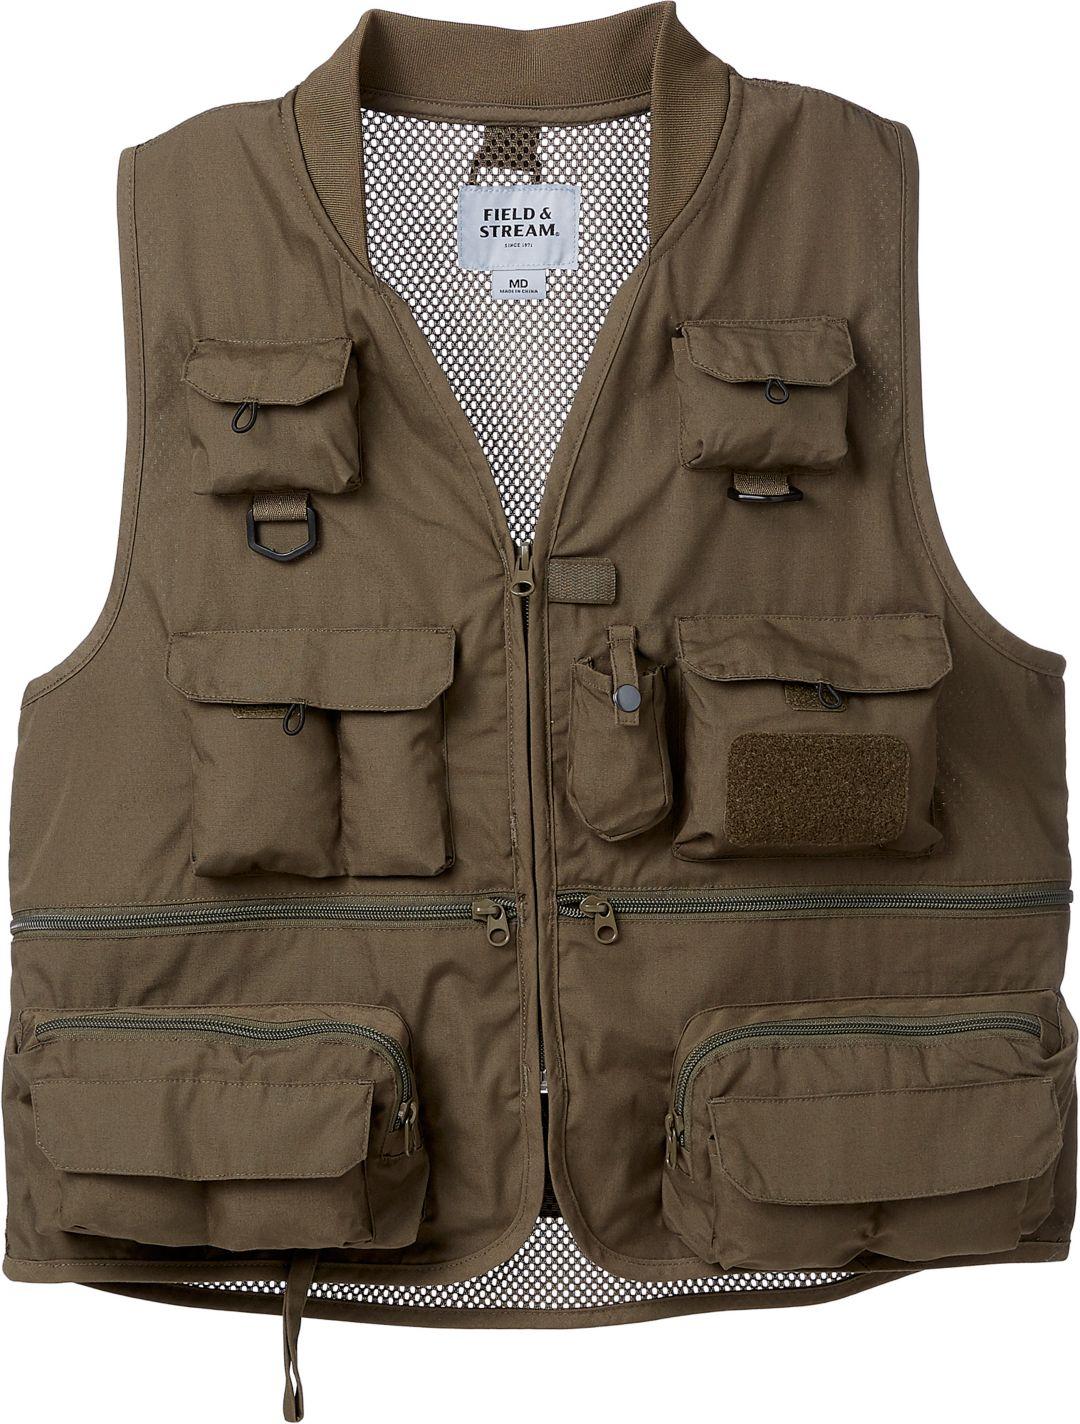 855c4f47df587 Field & Stream Men's Mesh Back Fishing Vest | Field & Stream